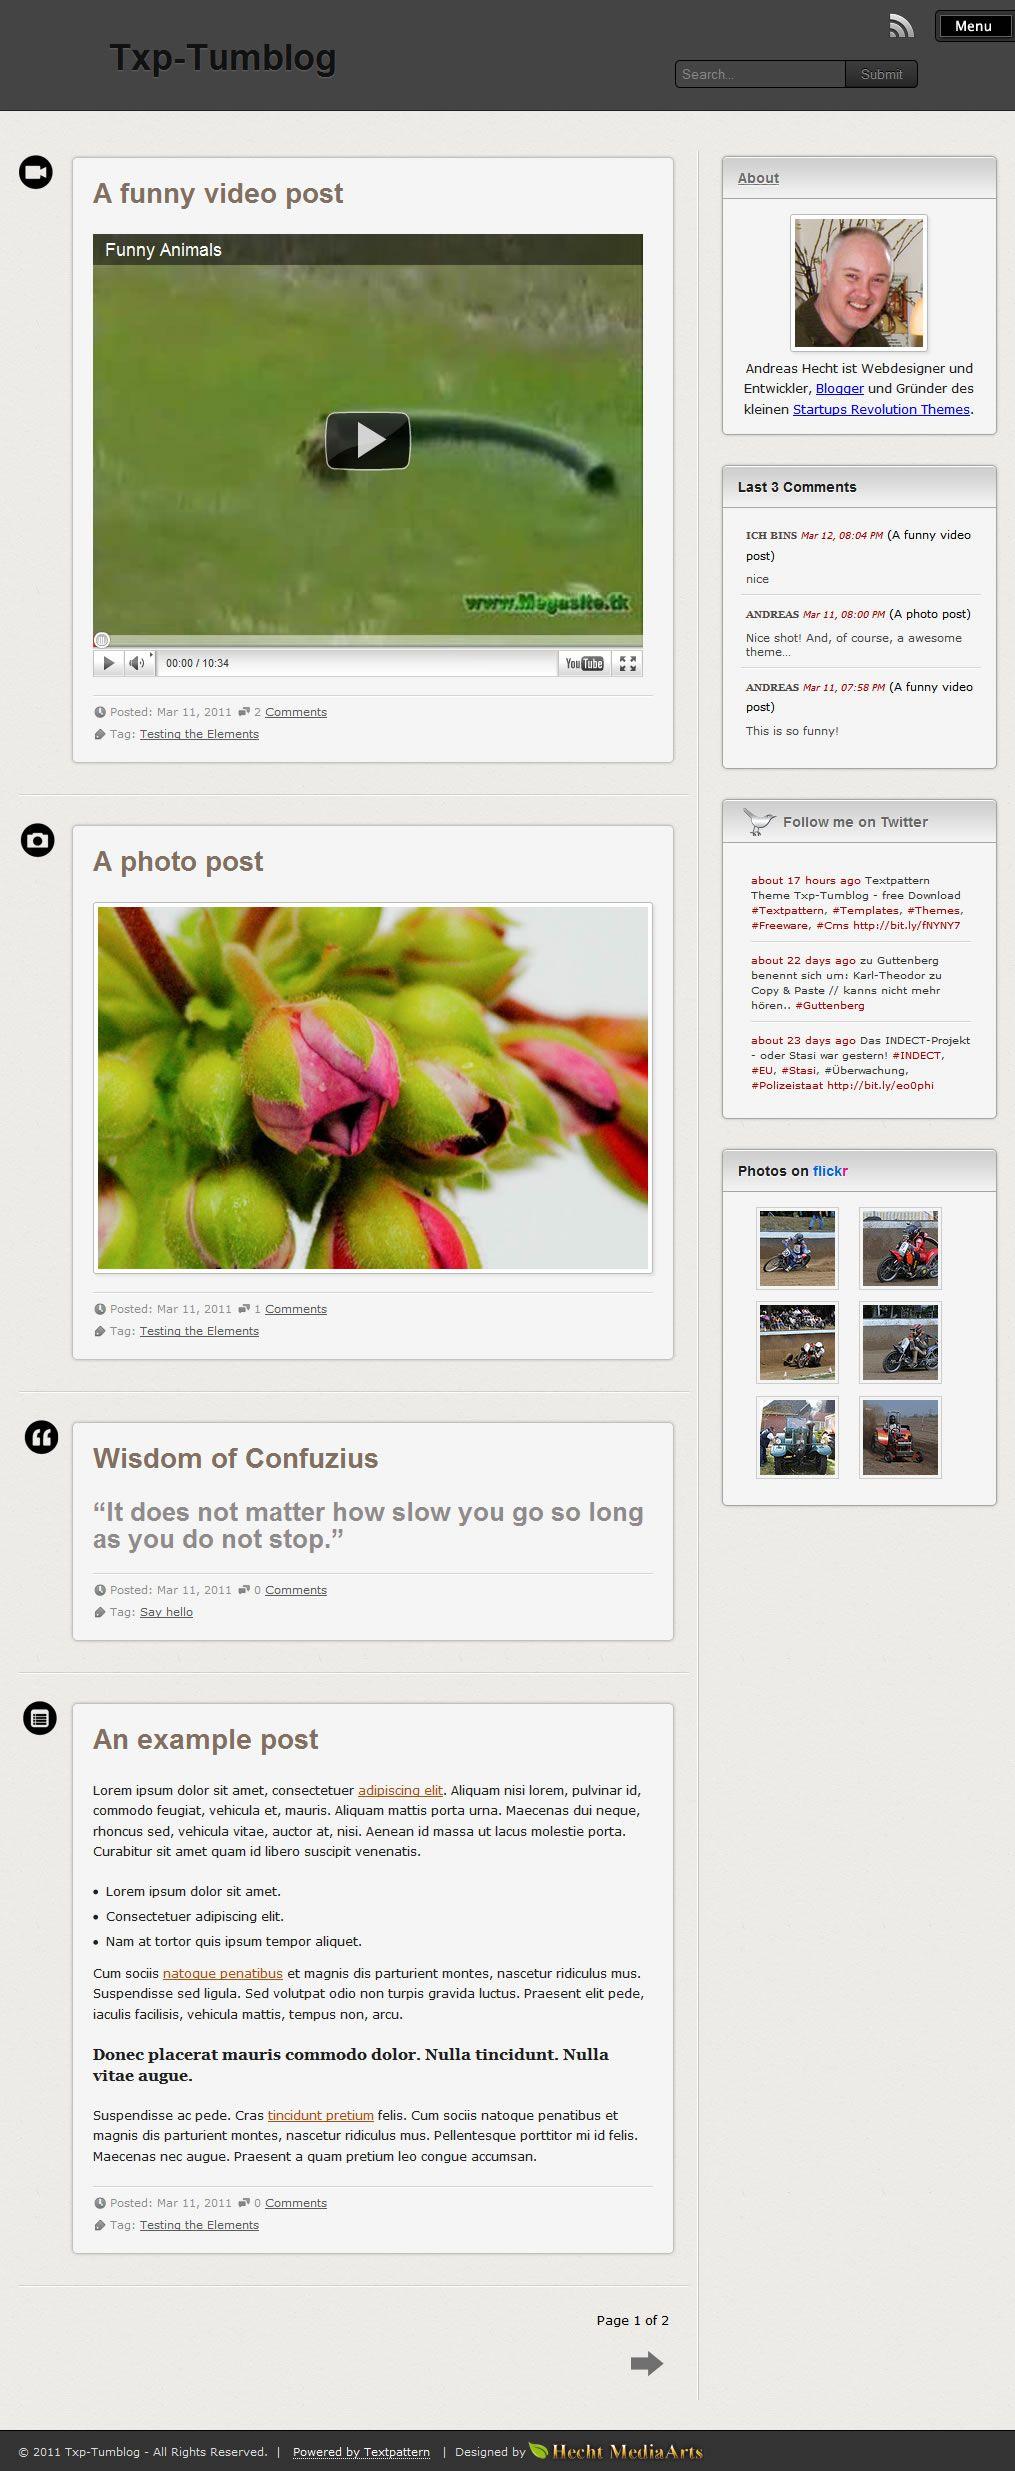 TXP-Tumblog | Textpattern Theme Designs | Pinterest